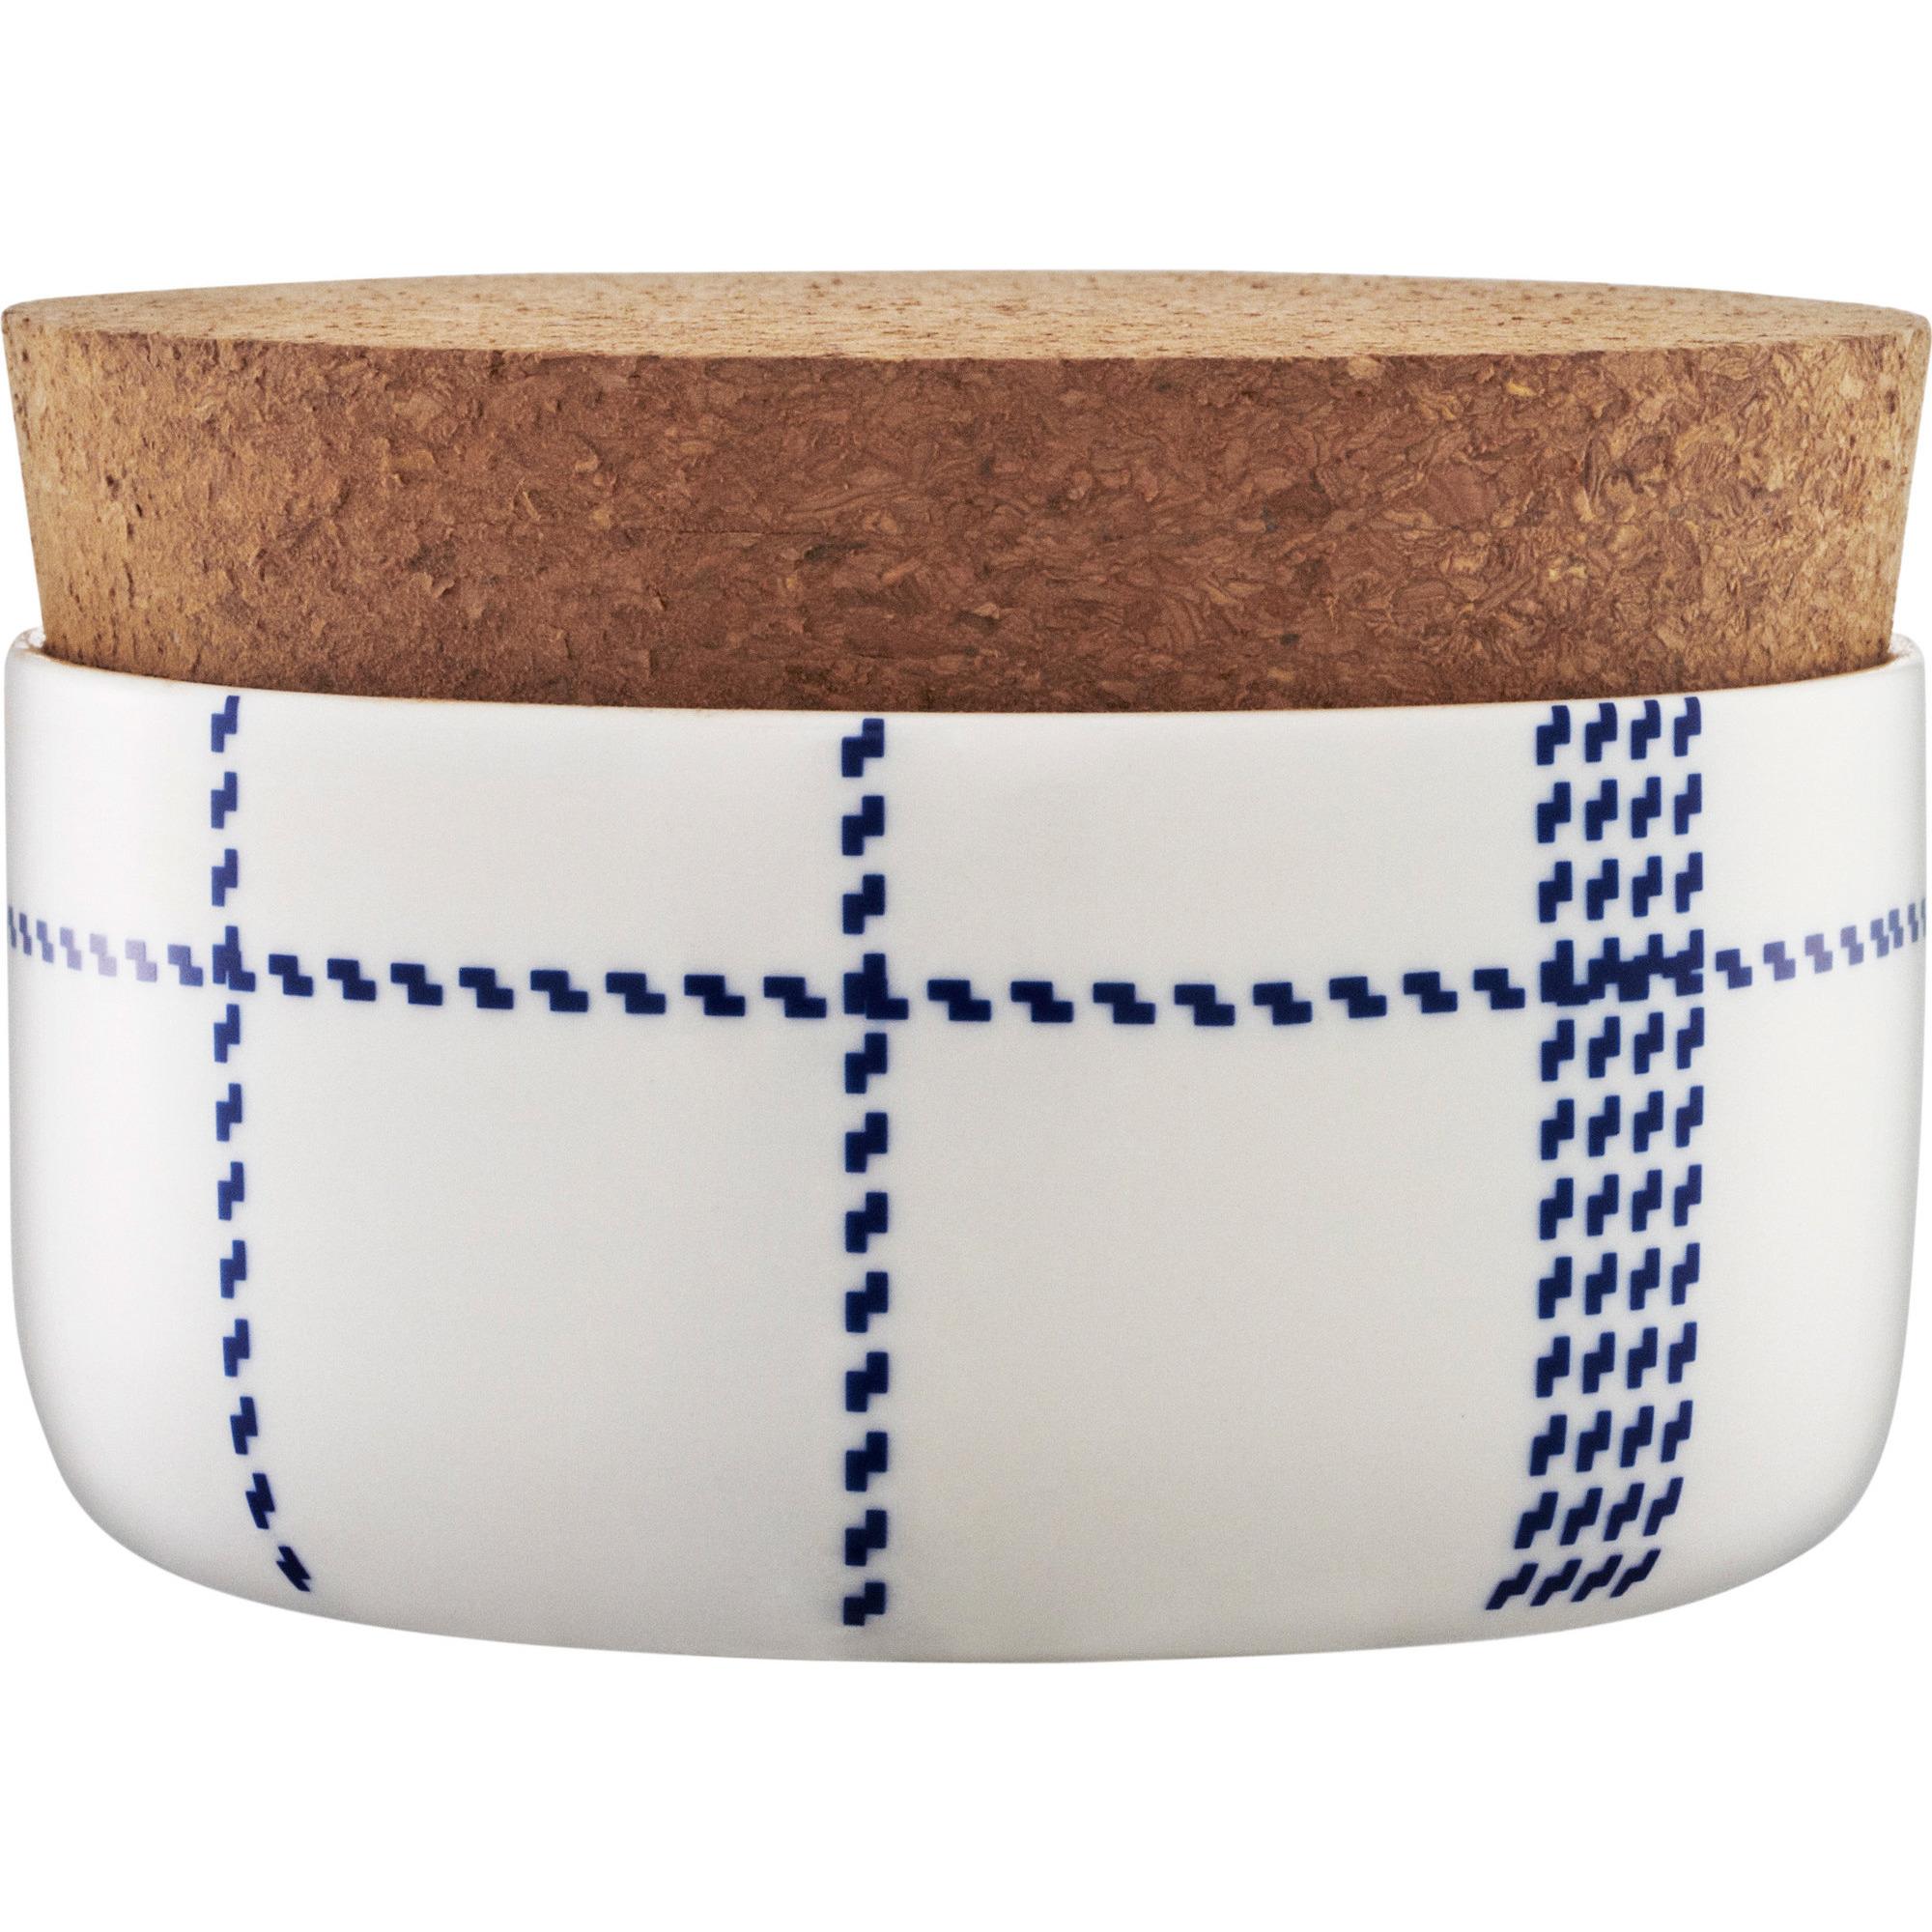 Normann Copenhagen Mormor Blue Sugar Bowl 25 cl Wh